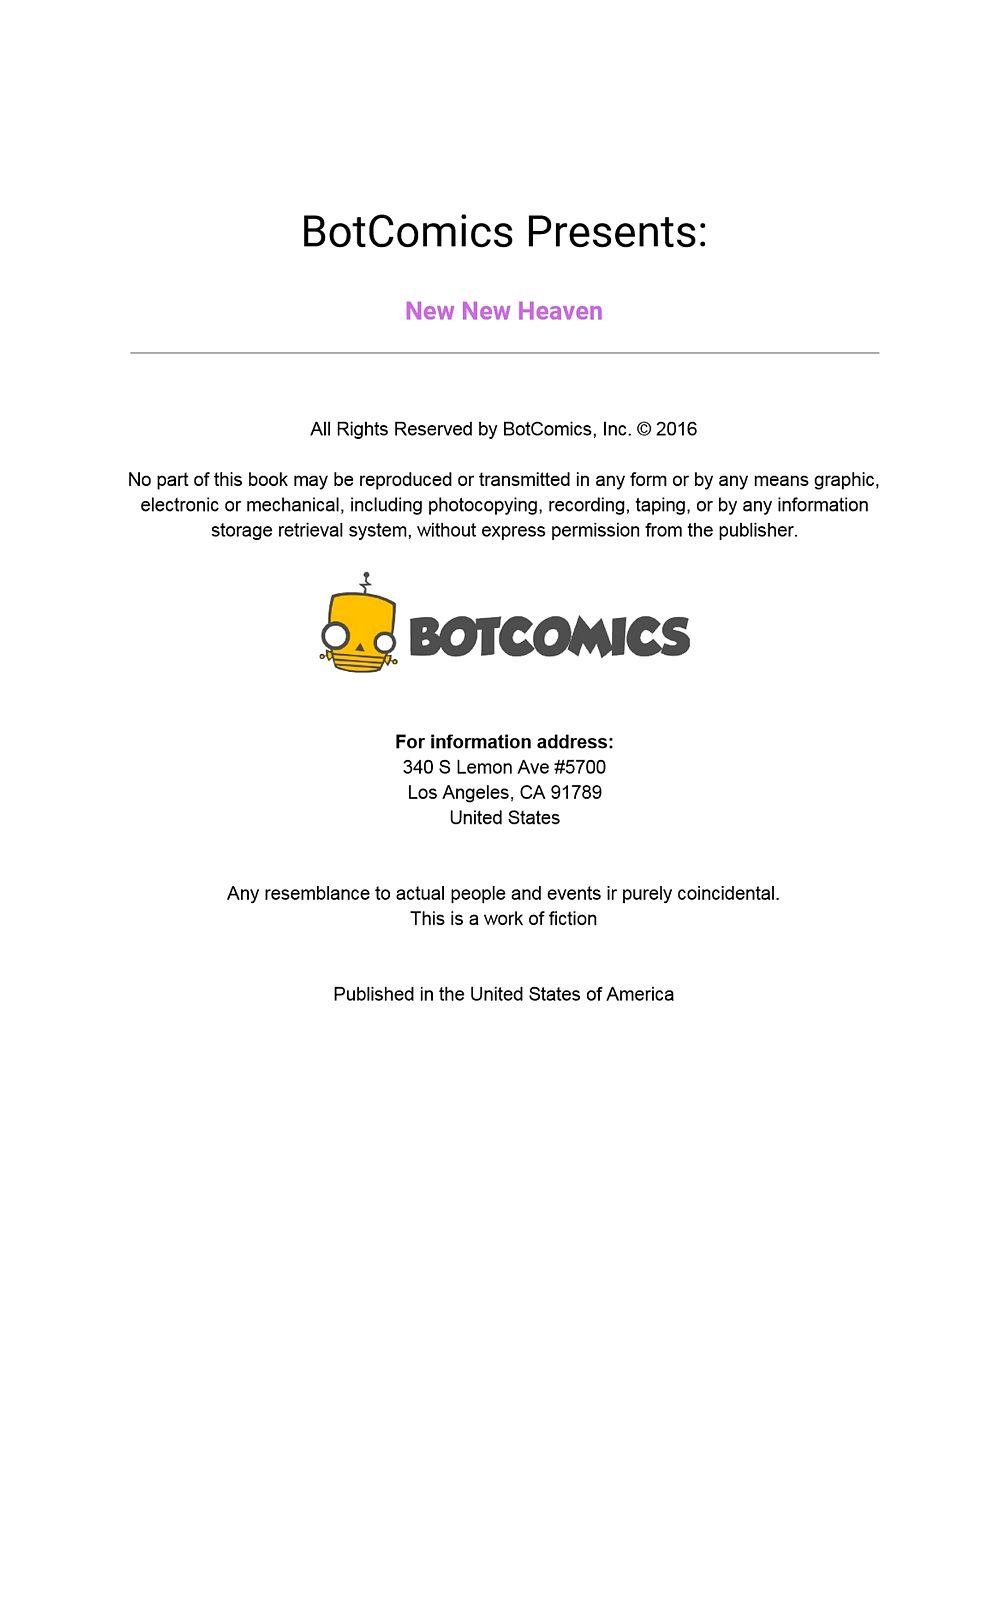 Bot- New New Heaven – Bob Saget